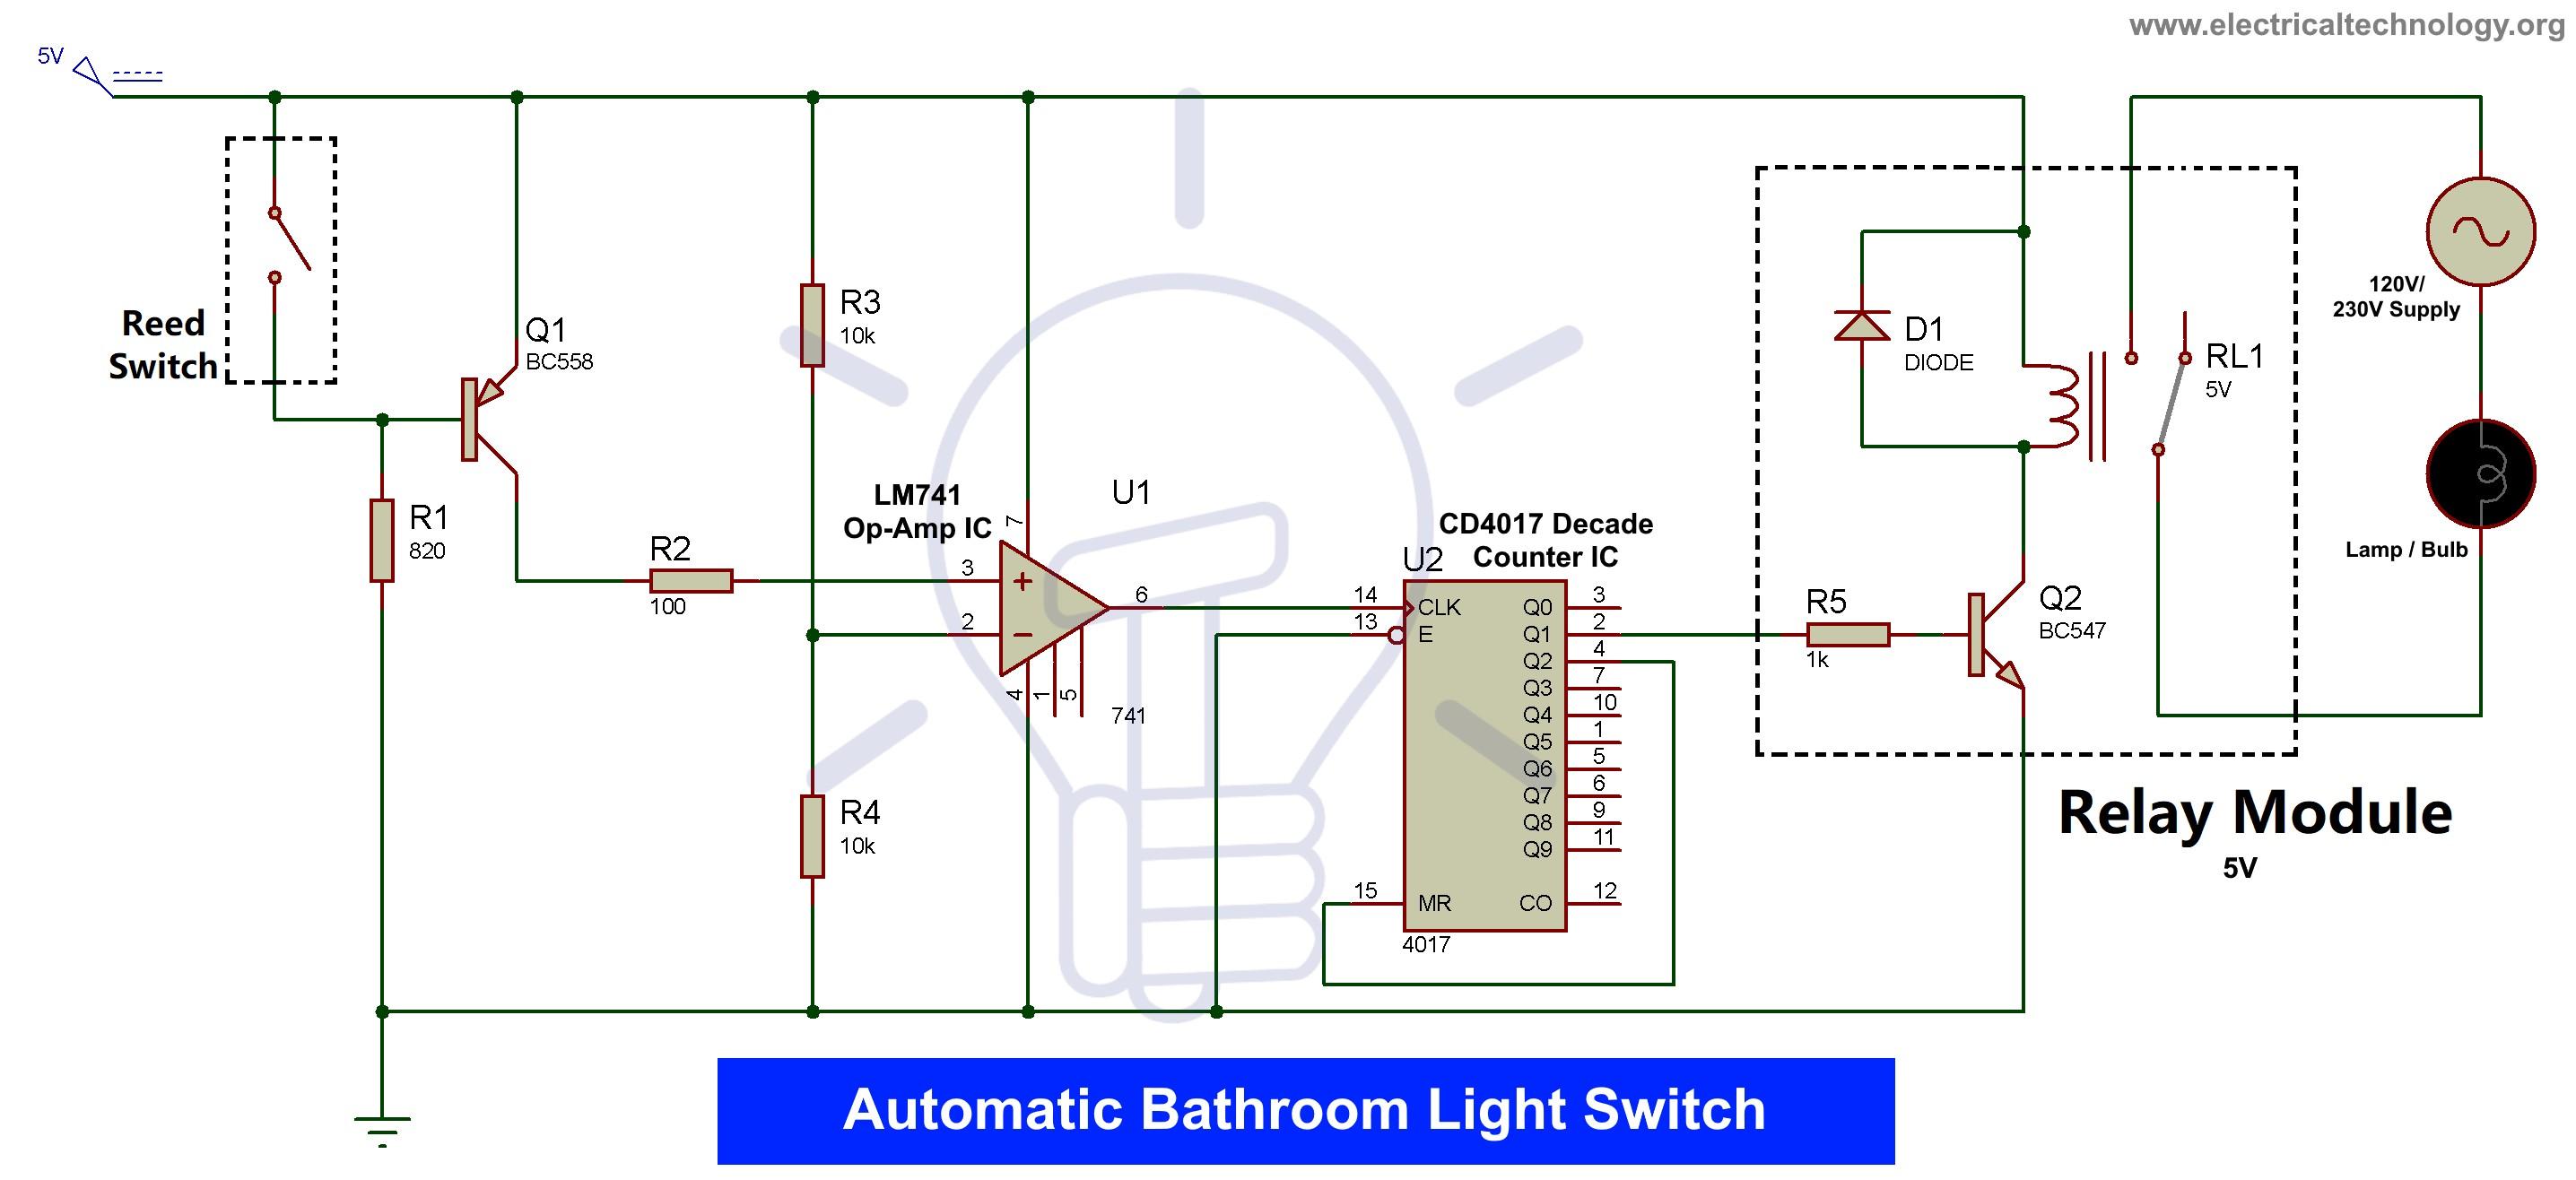 Automatic bathroom light switch circuit Diagram